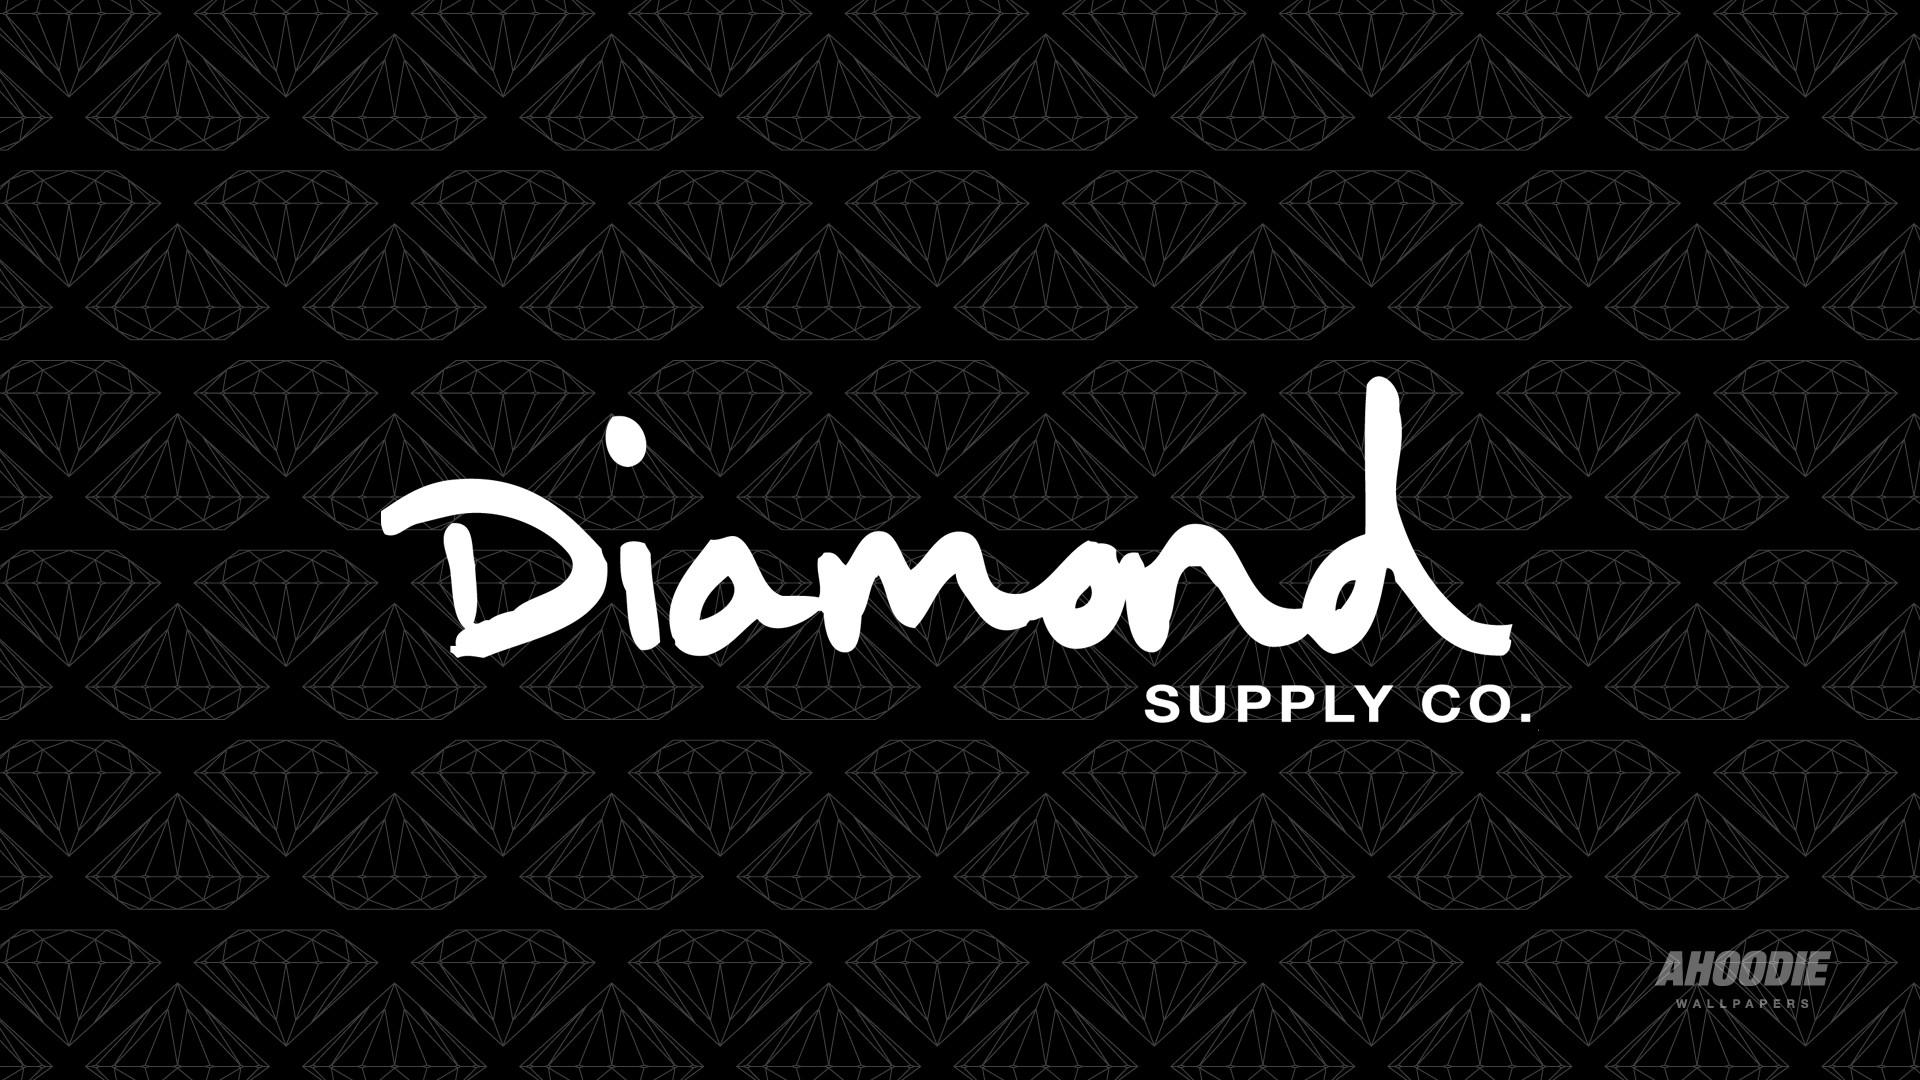 Diamond Supply Co wallpaper 201613